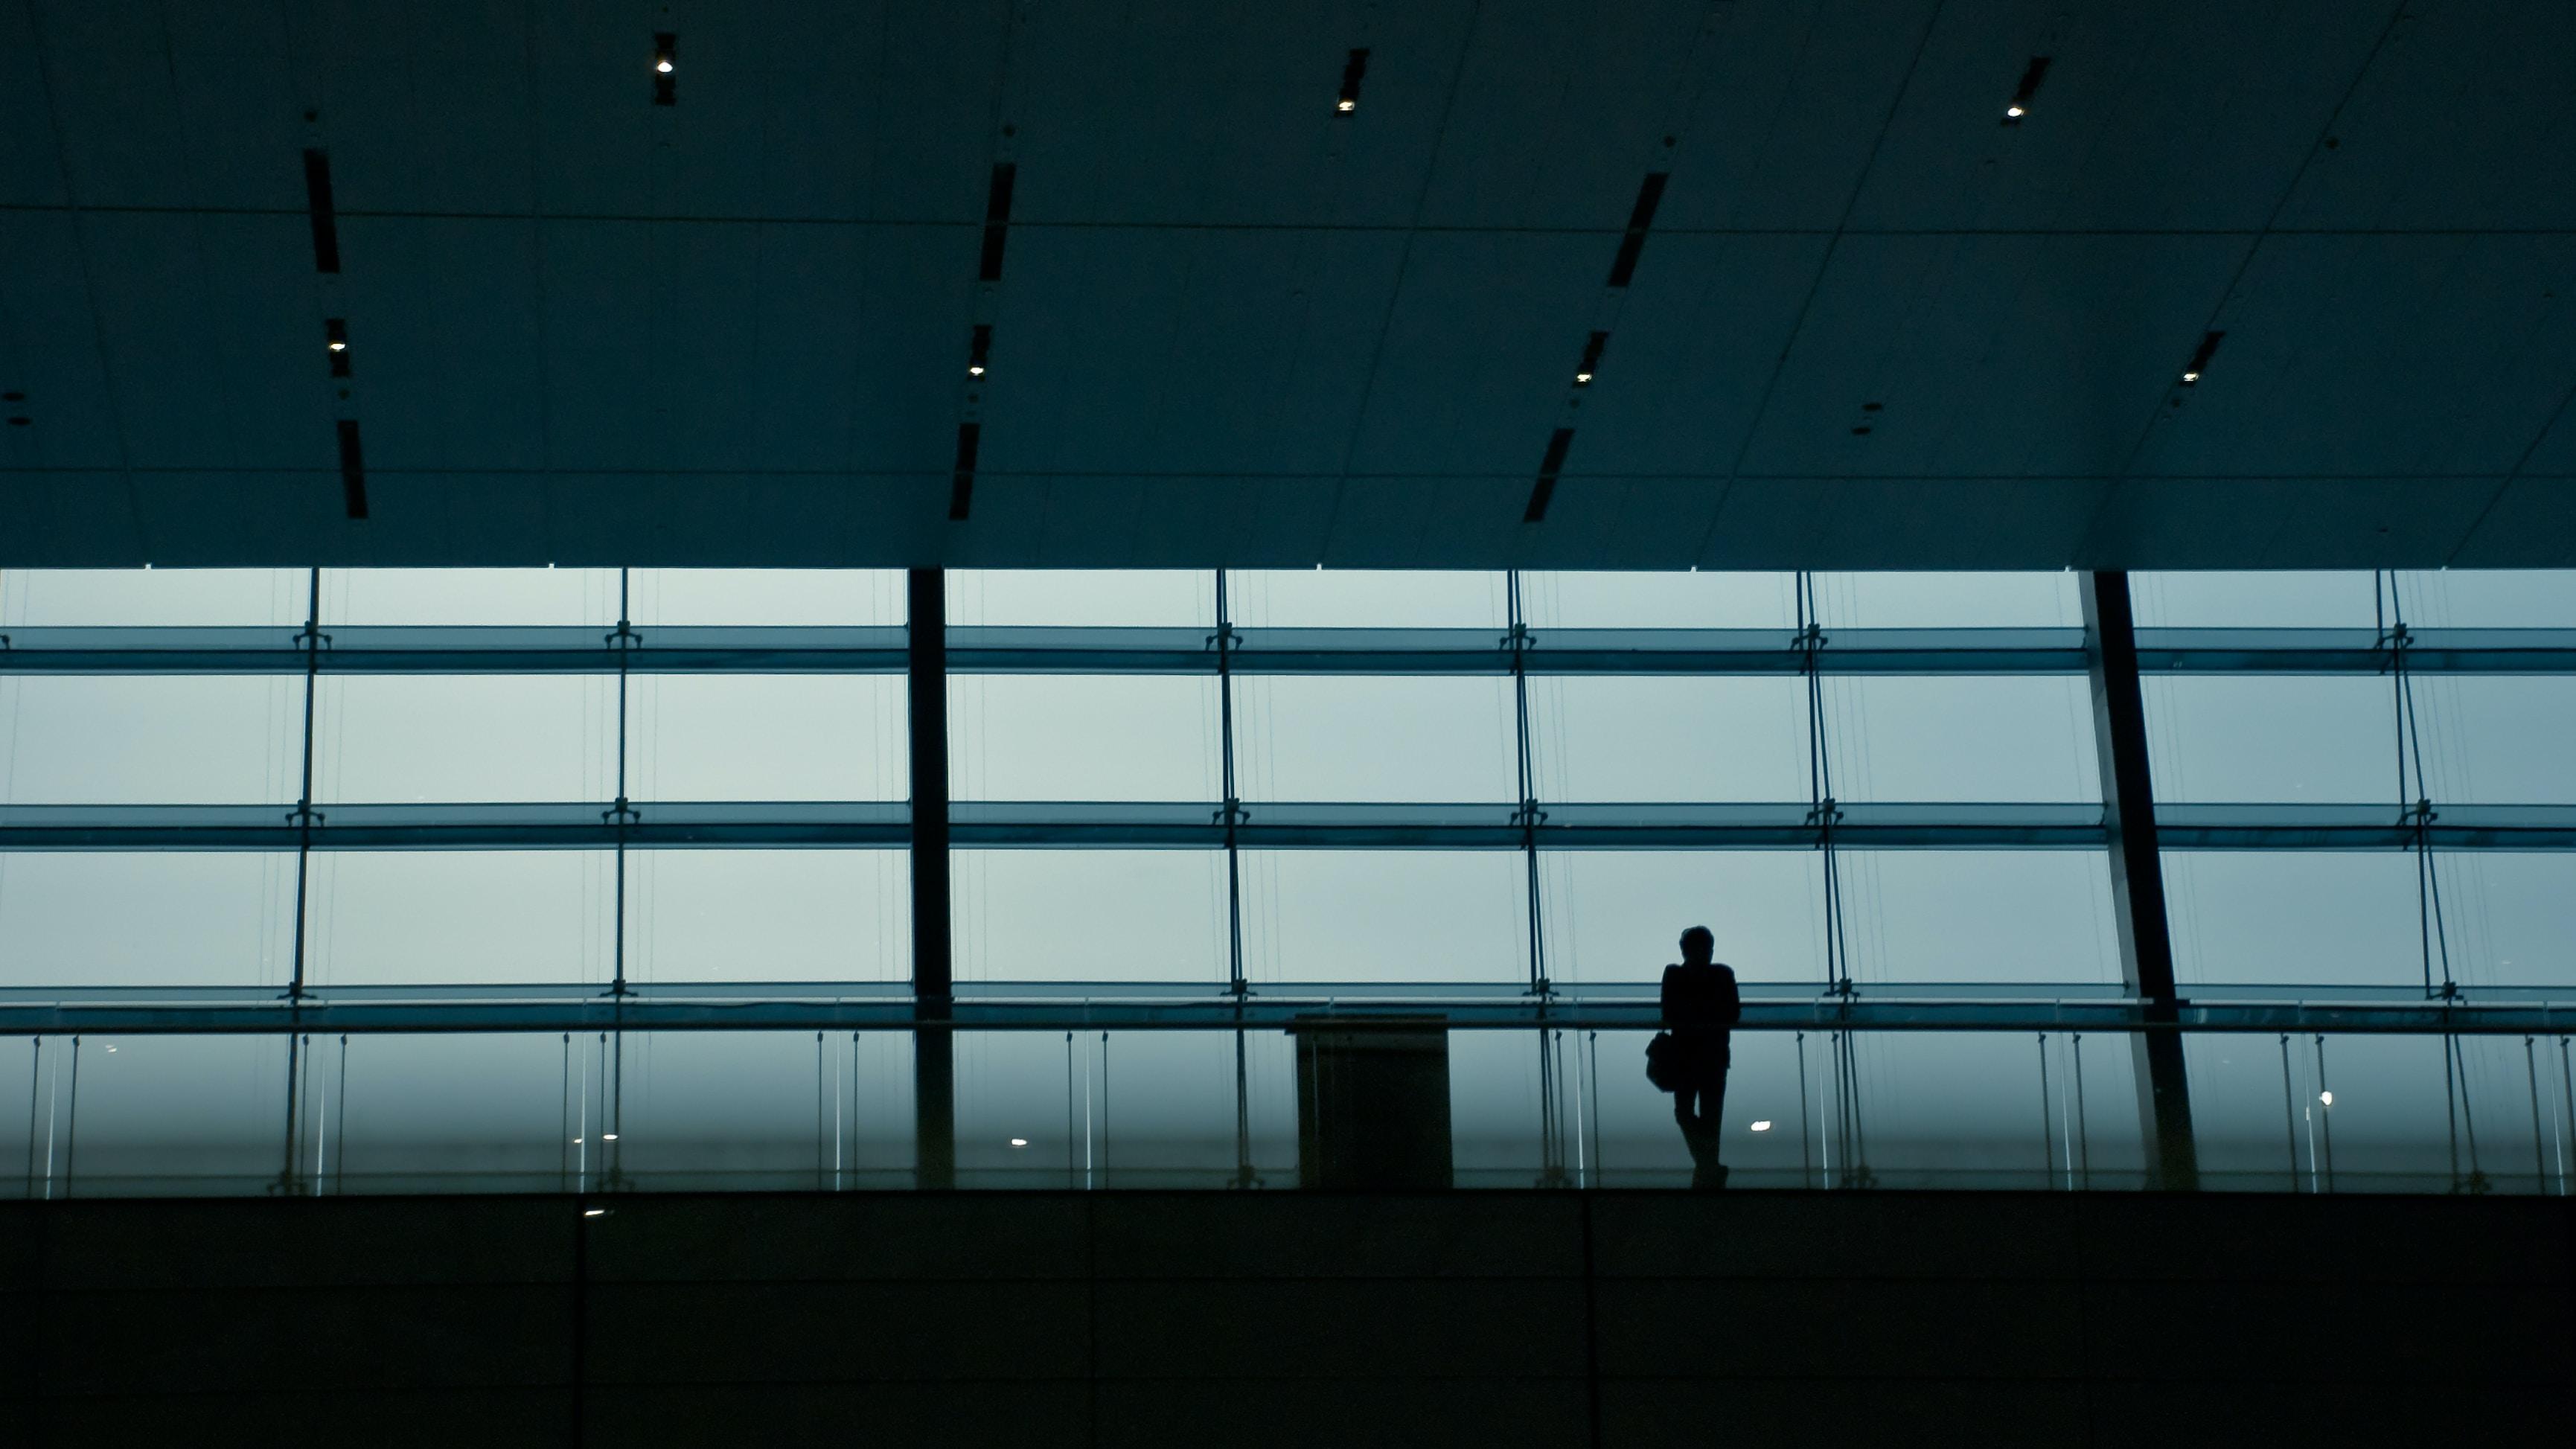 A silhouette of a person in a dark railway terminal